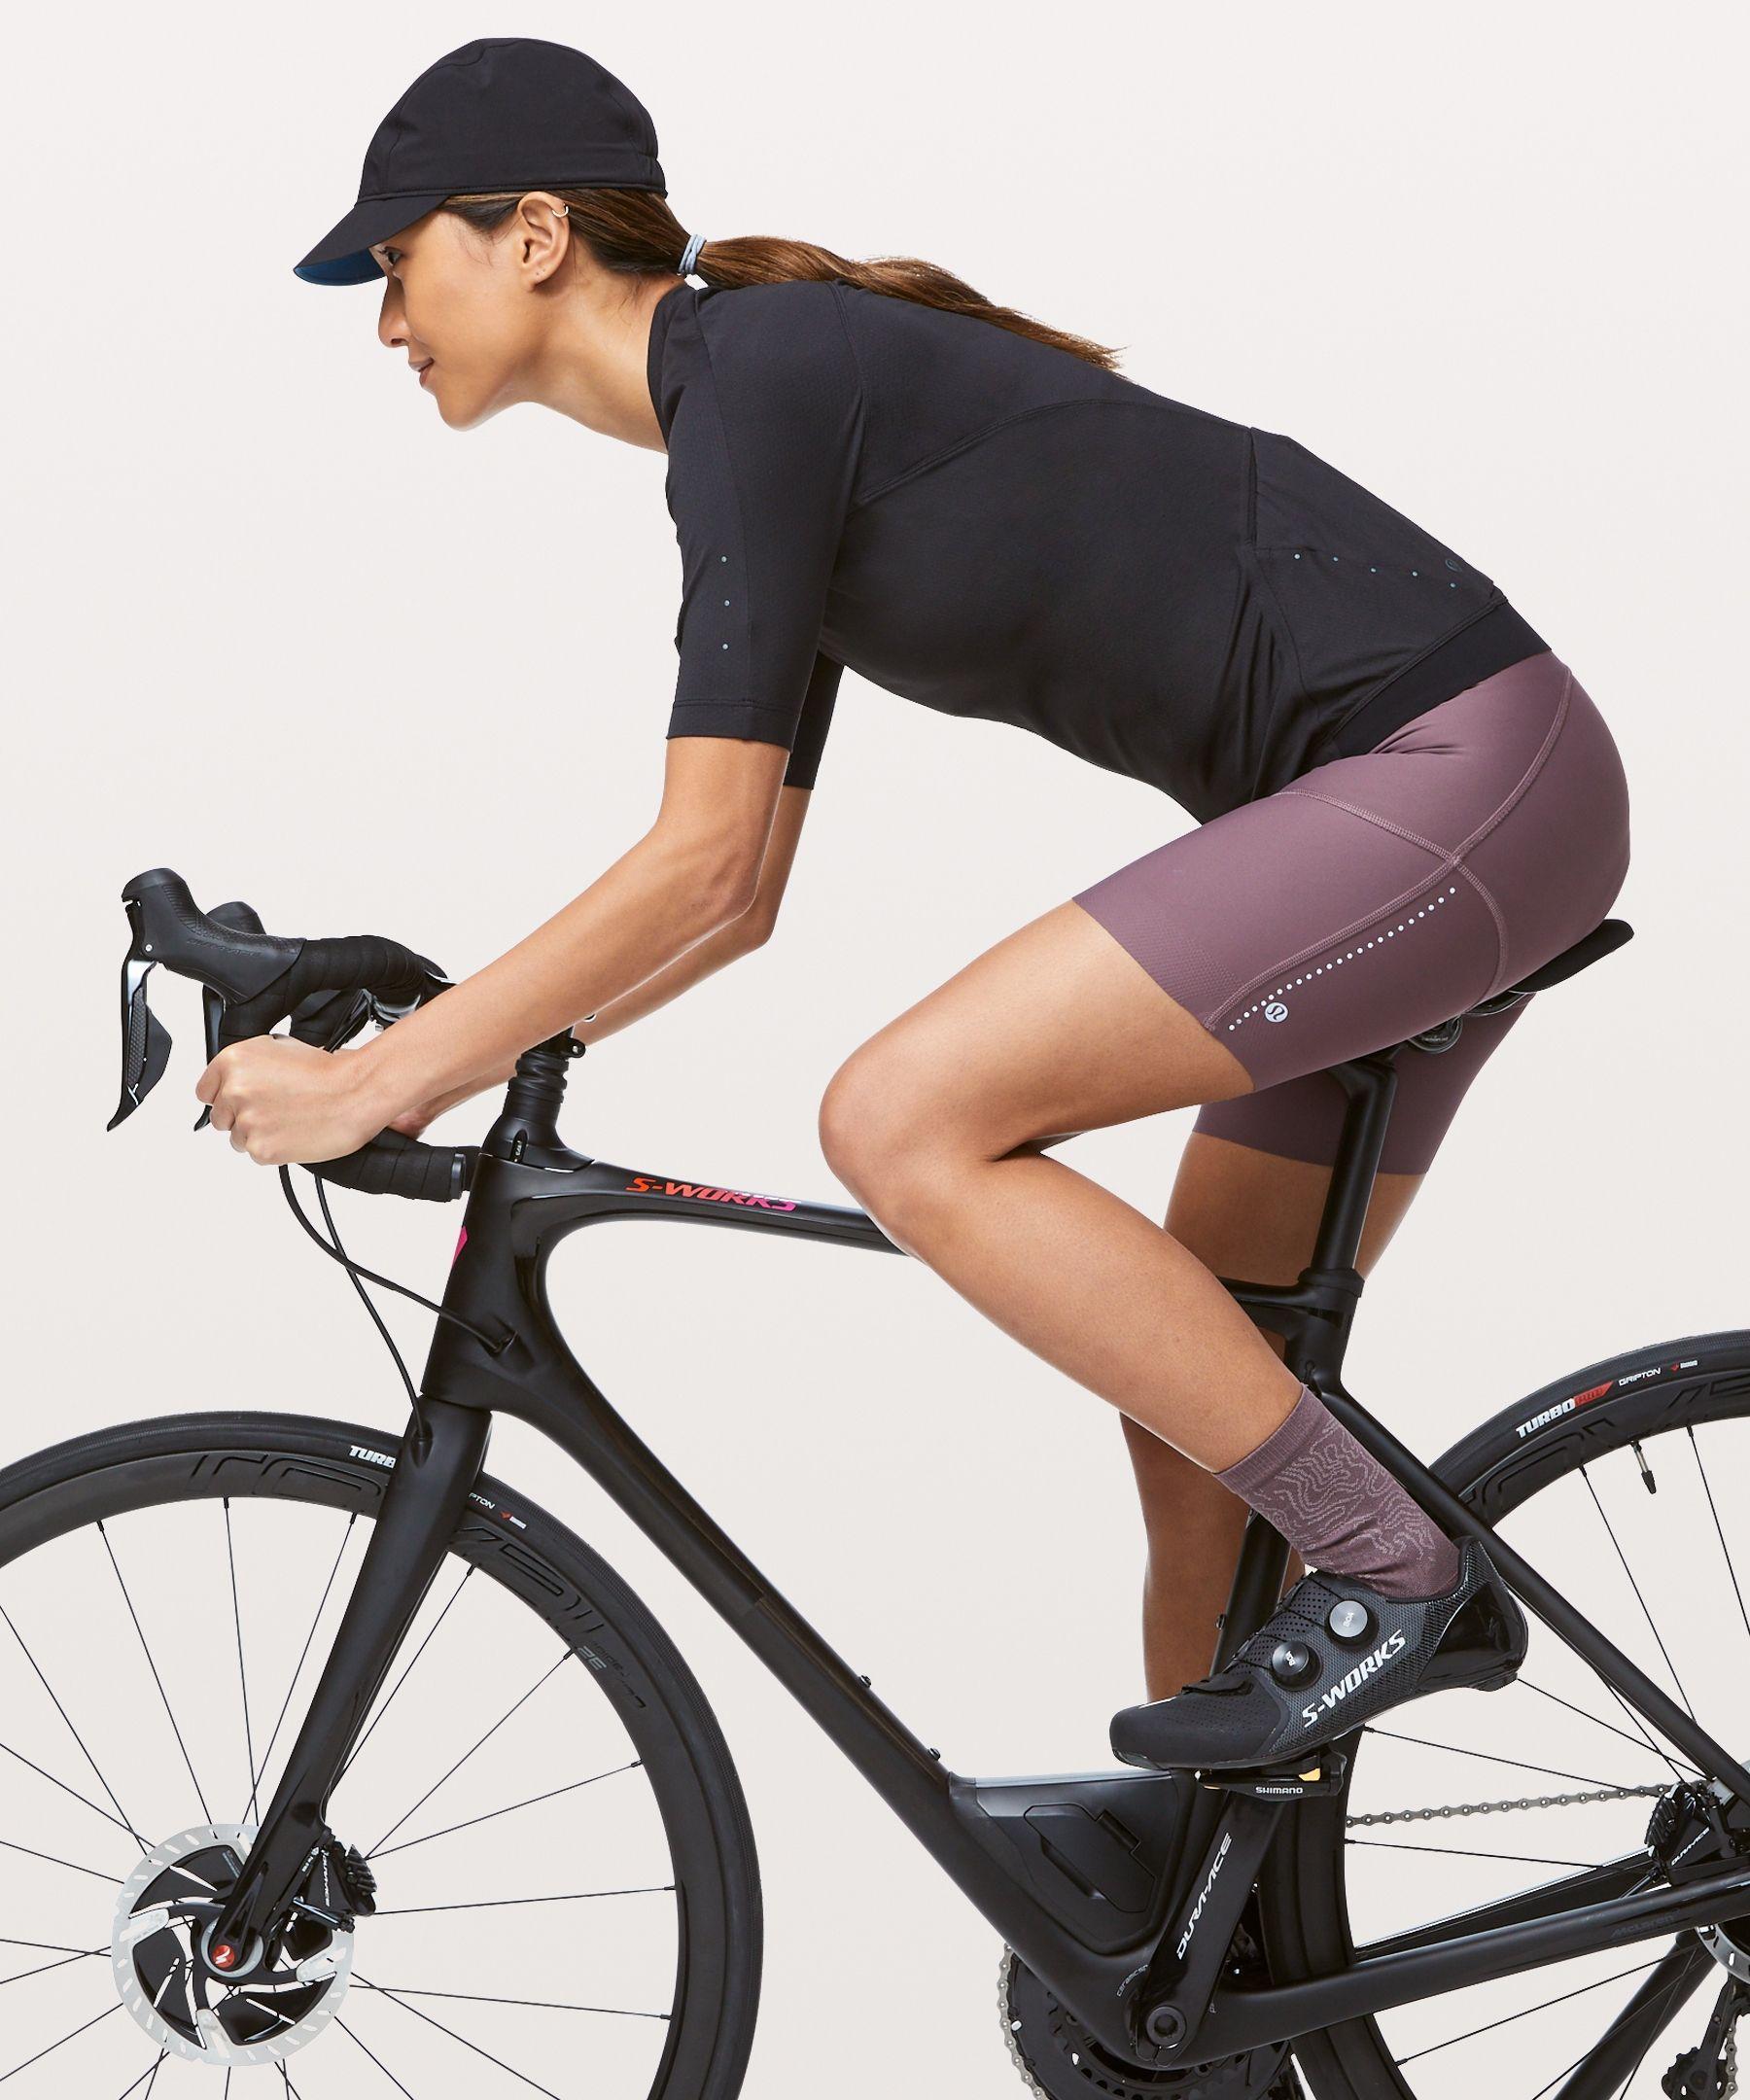 Lululemon Women S City To Summit Light Cycling Short Antique Bark Size L Cycling Shorts Women Cycling Short Indoor Cycling Class